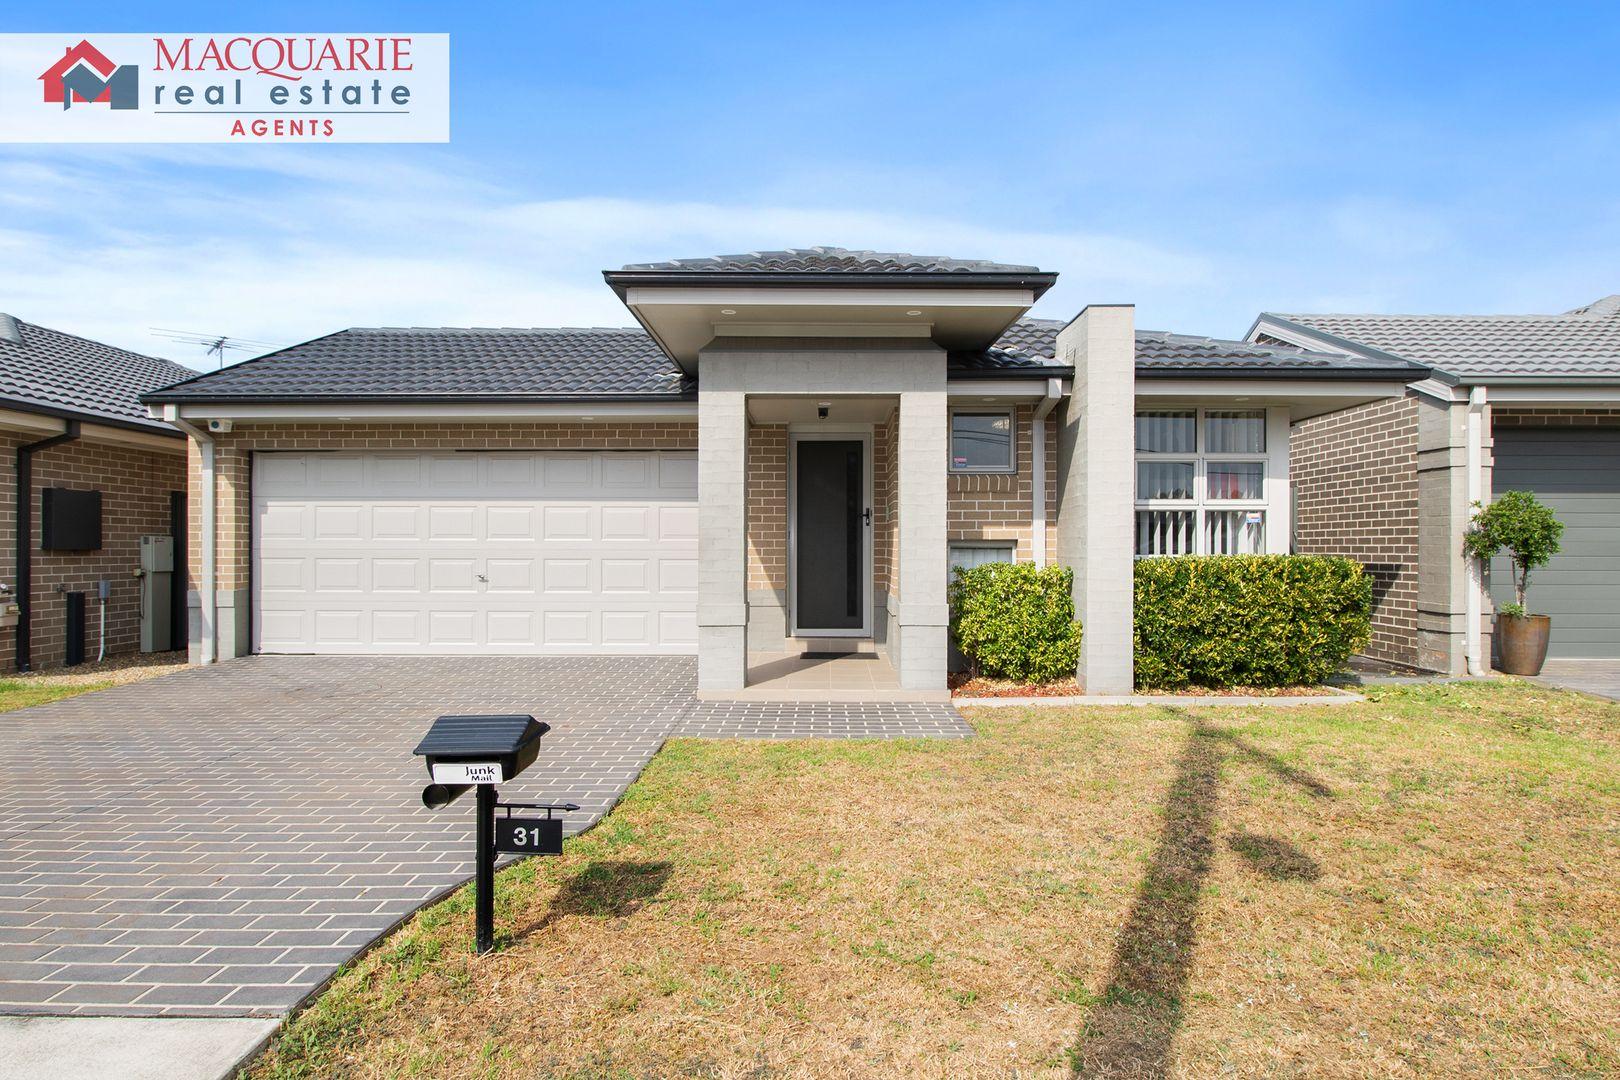 31 Maple  Road, Casula NSW 2170, Image 0